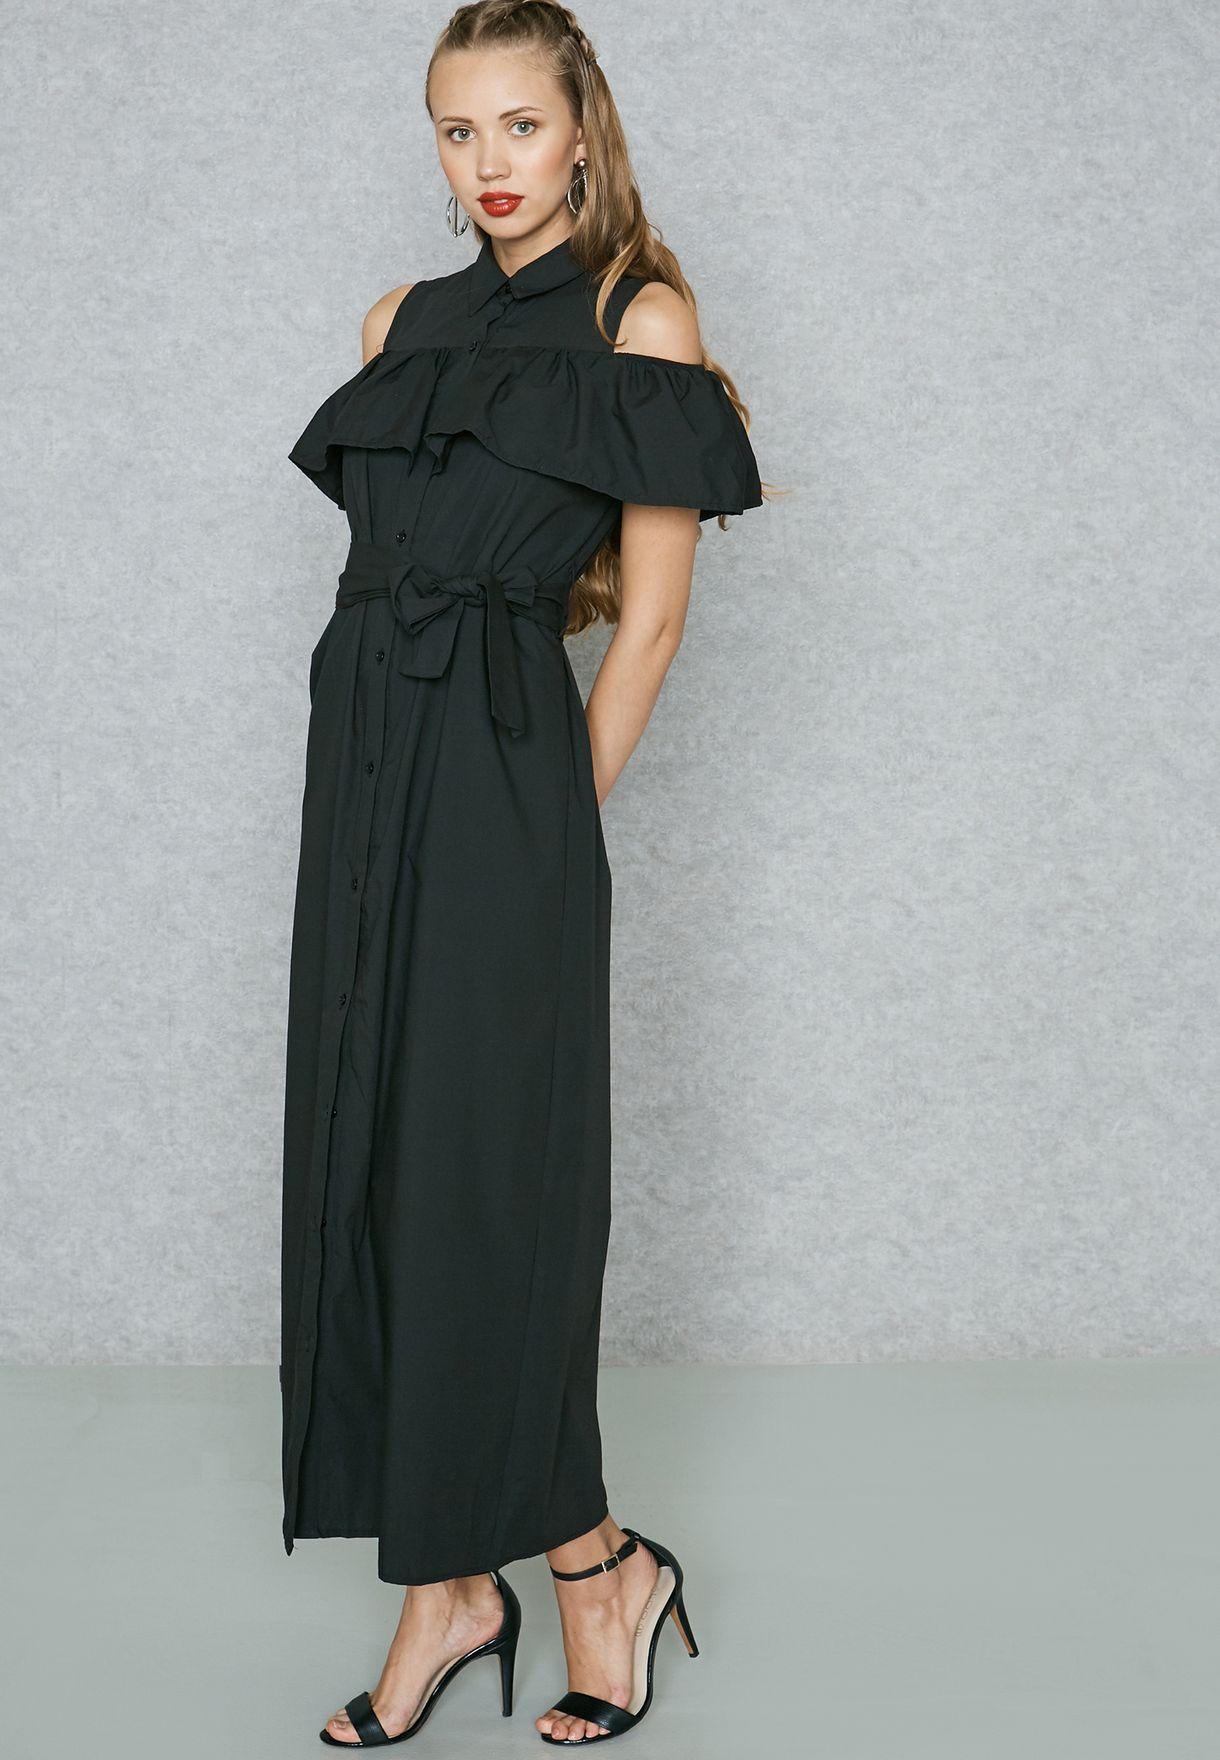 e29e572ded385b Shop Ginger black Ruffle Cold Shoulder Shirt Maxi Dress W253001A for ...